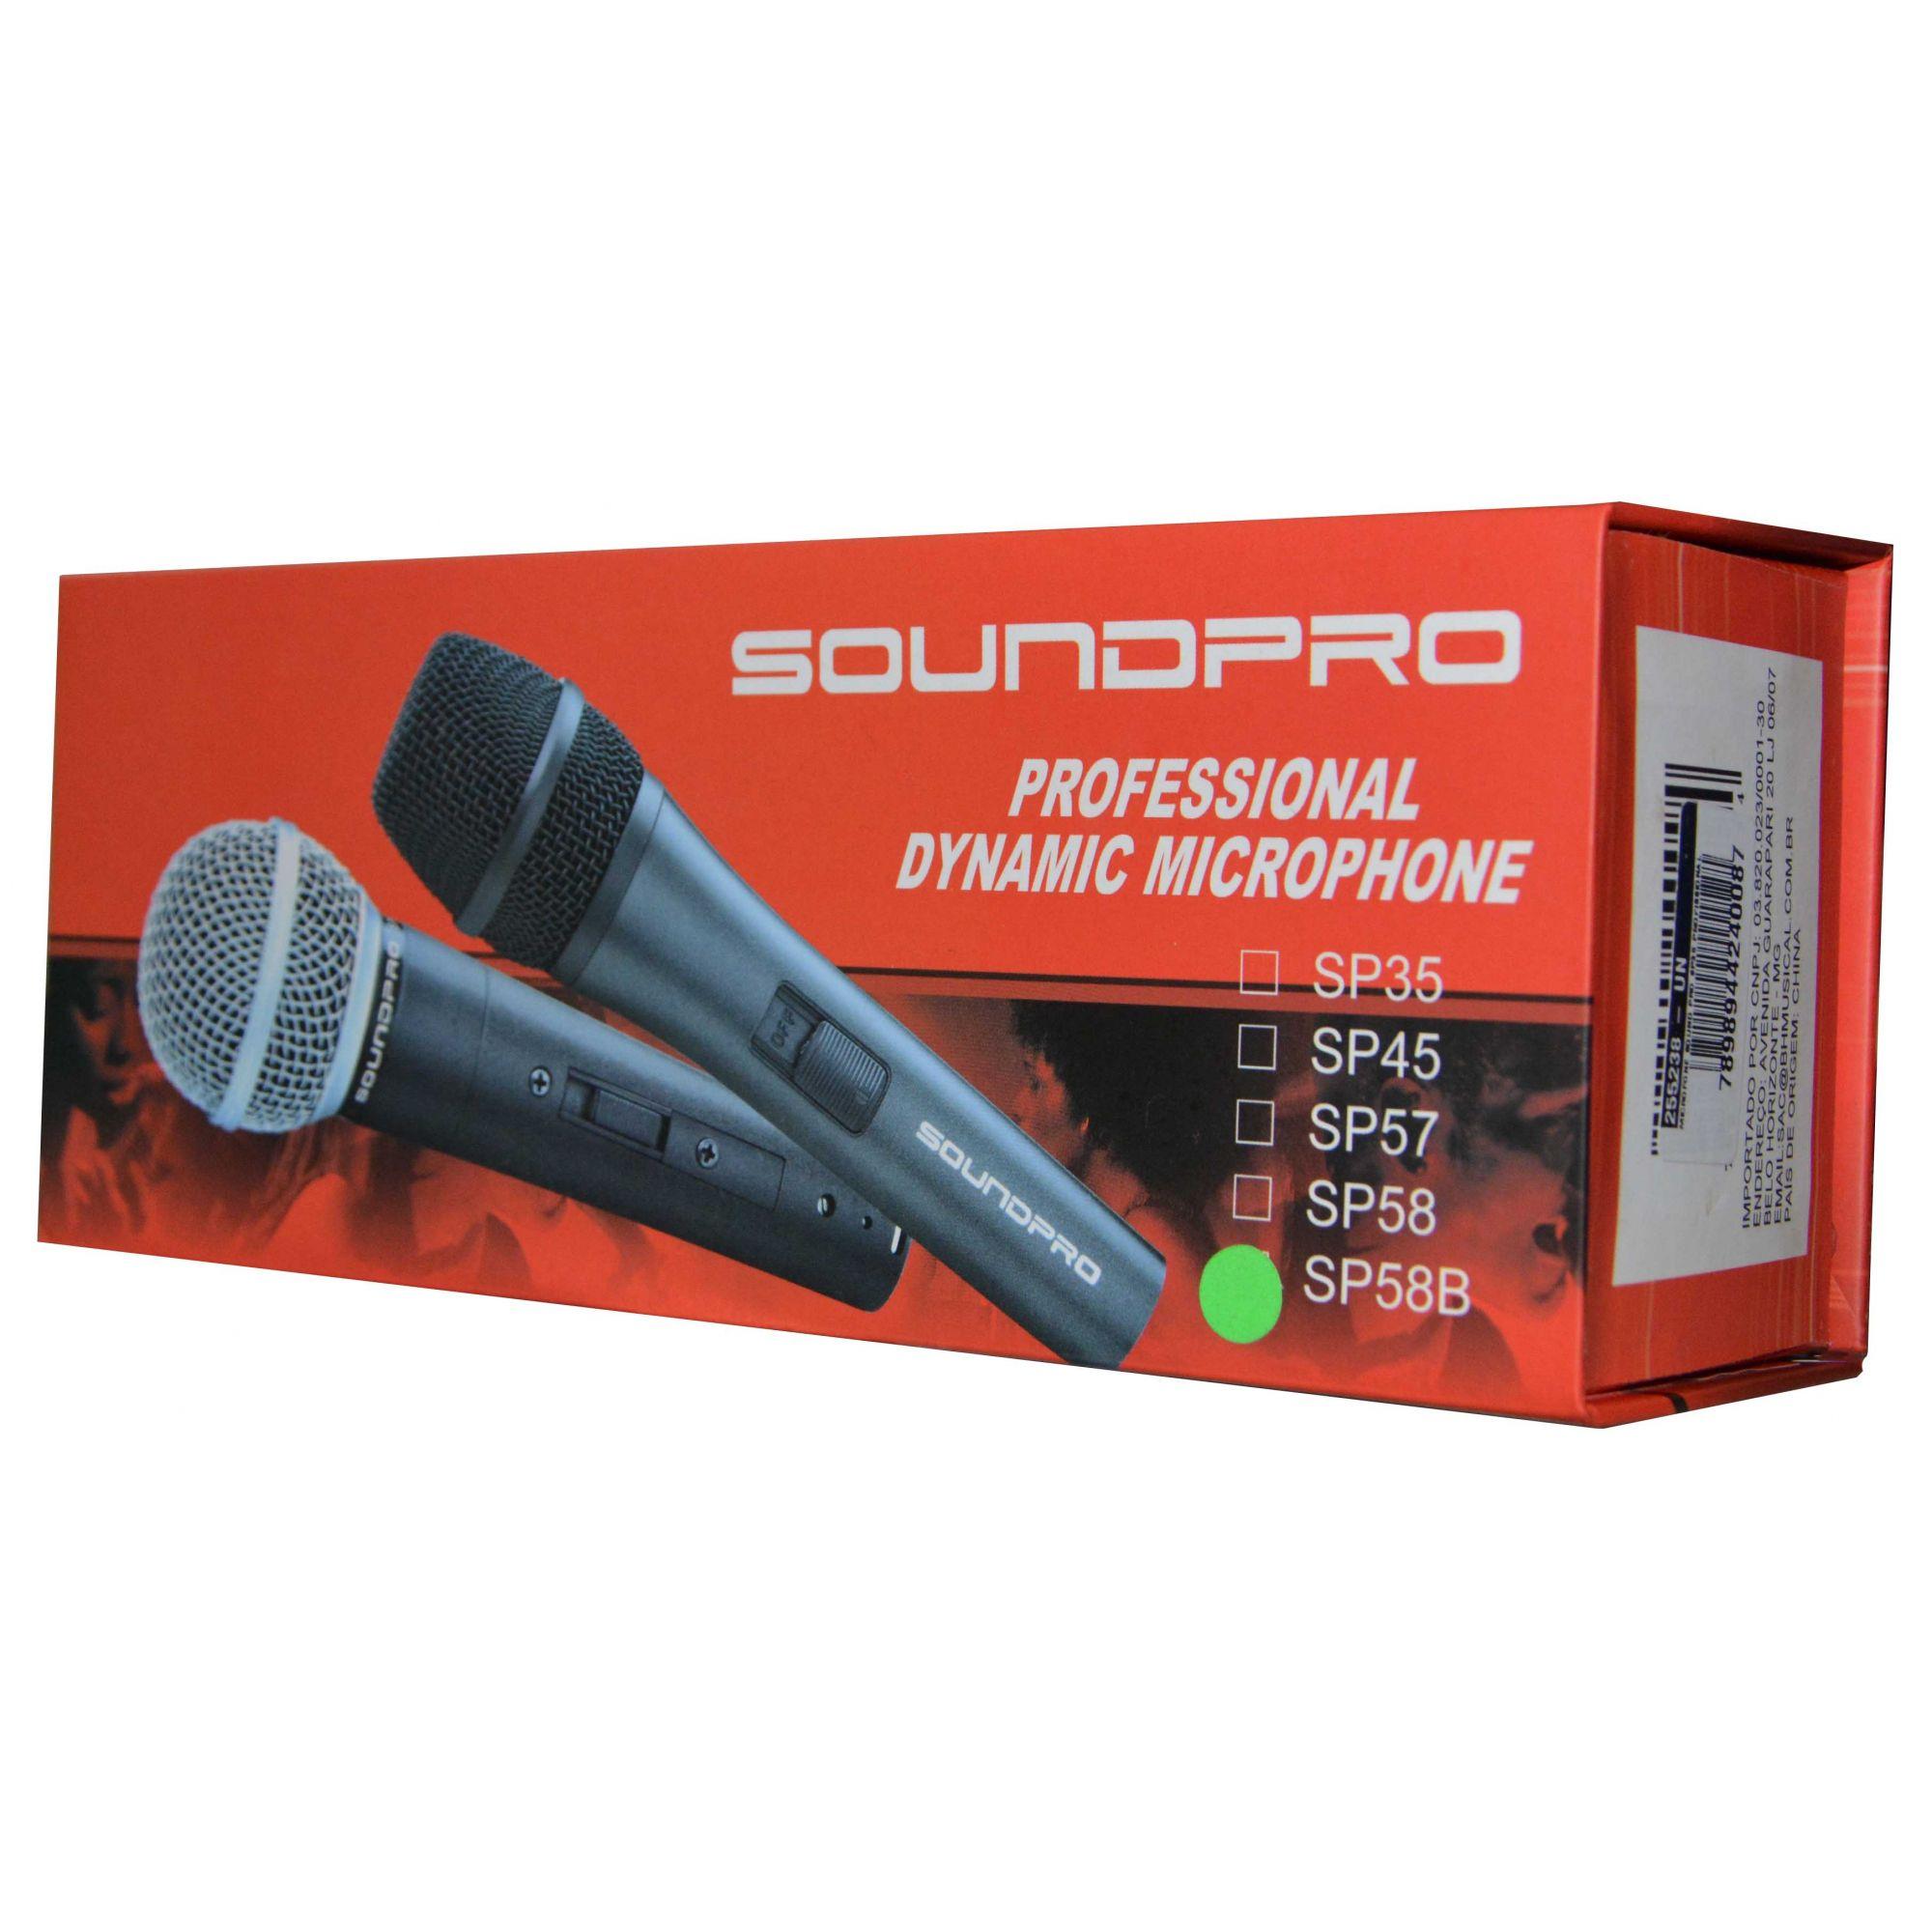 Microfone Profissional Soundpro Dinâmico SP58B